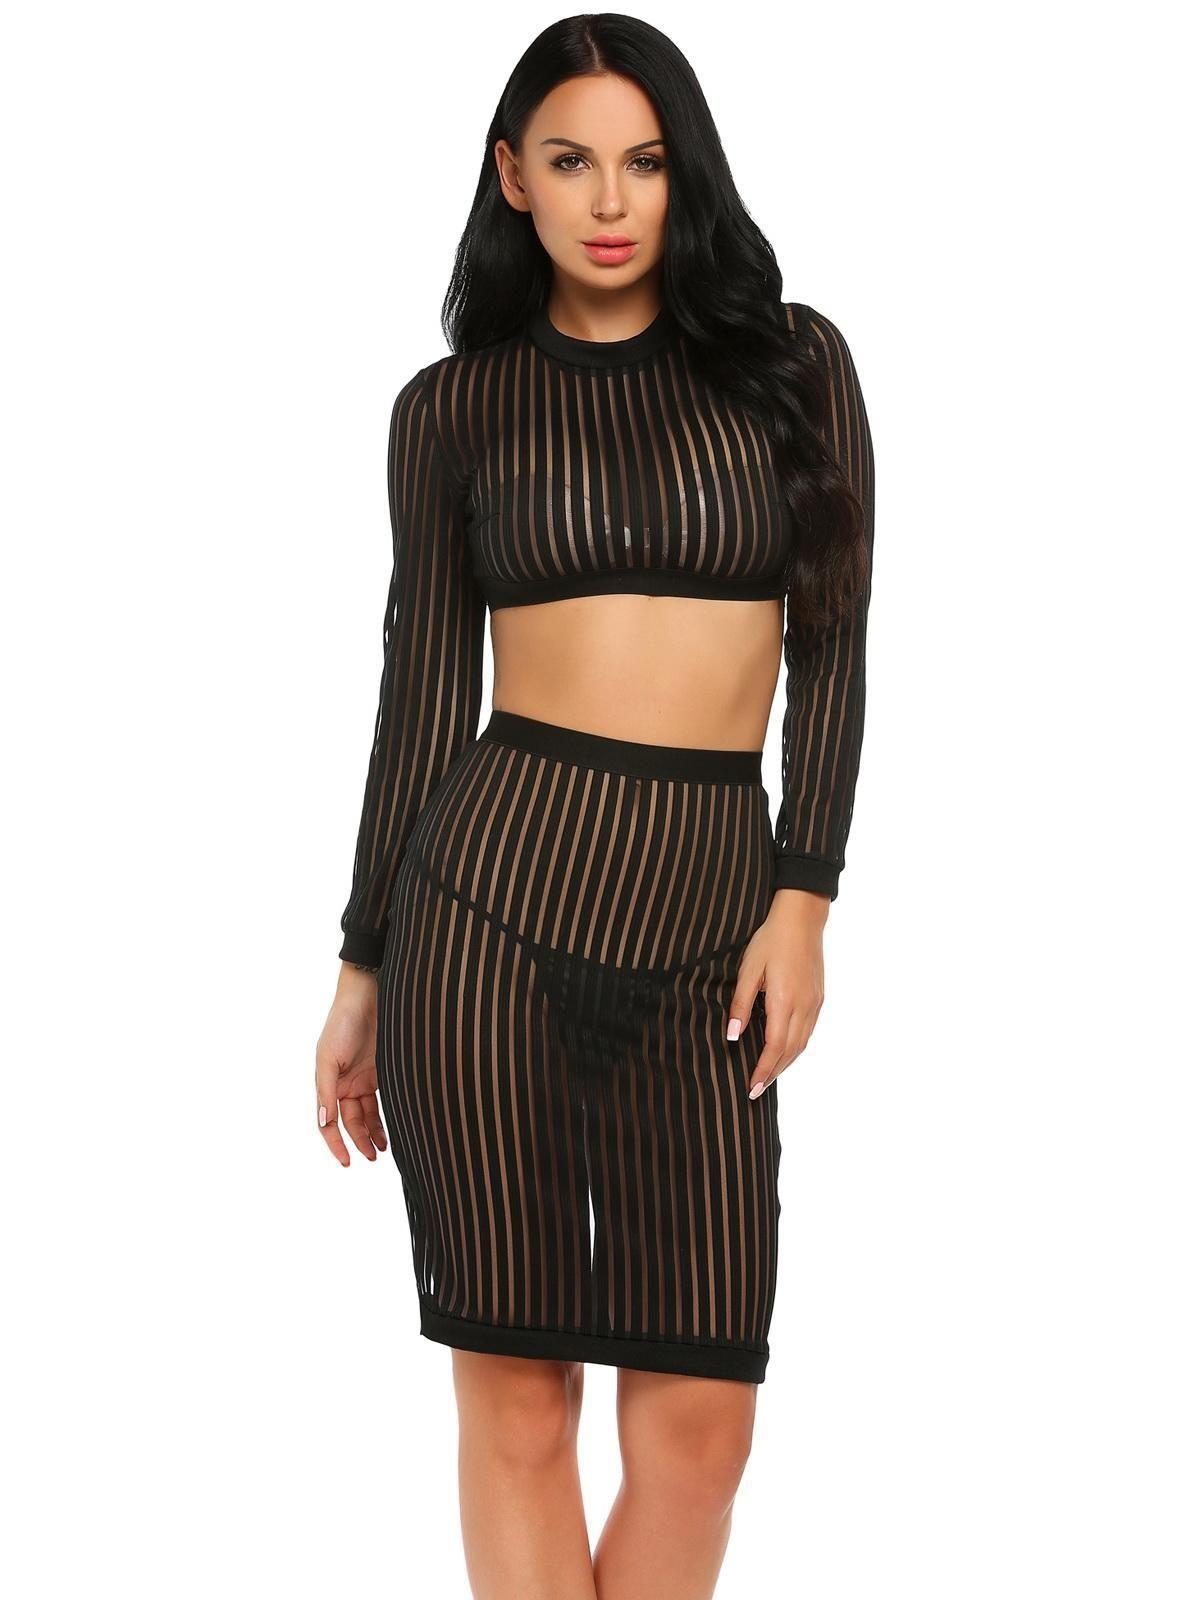 3cc080468d1 Sunshine Women Sexy Long Sleeve Sleeve Sheer Striped Crop Top And ...